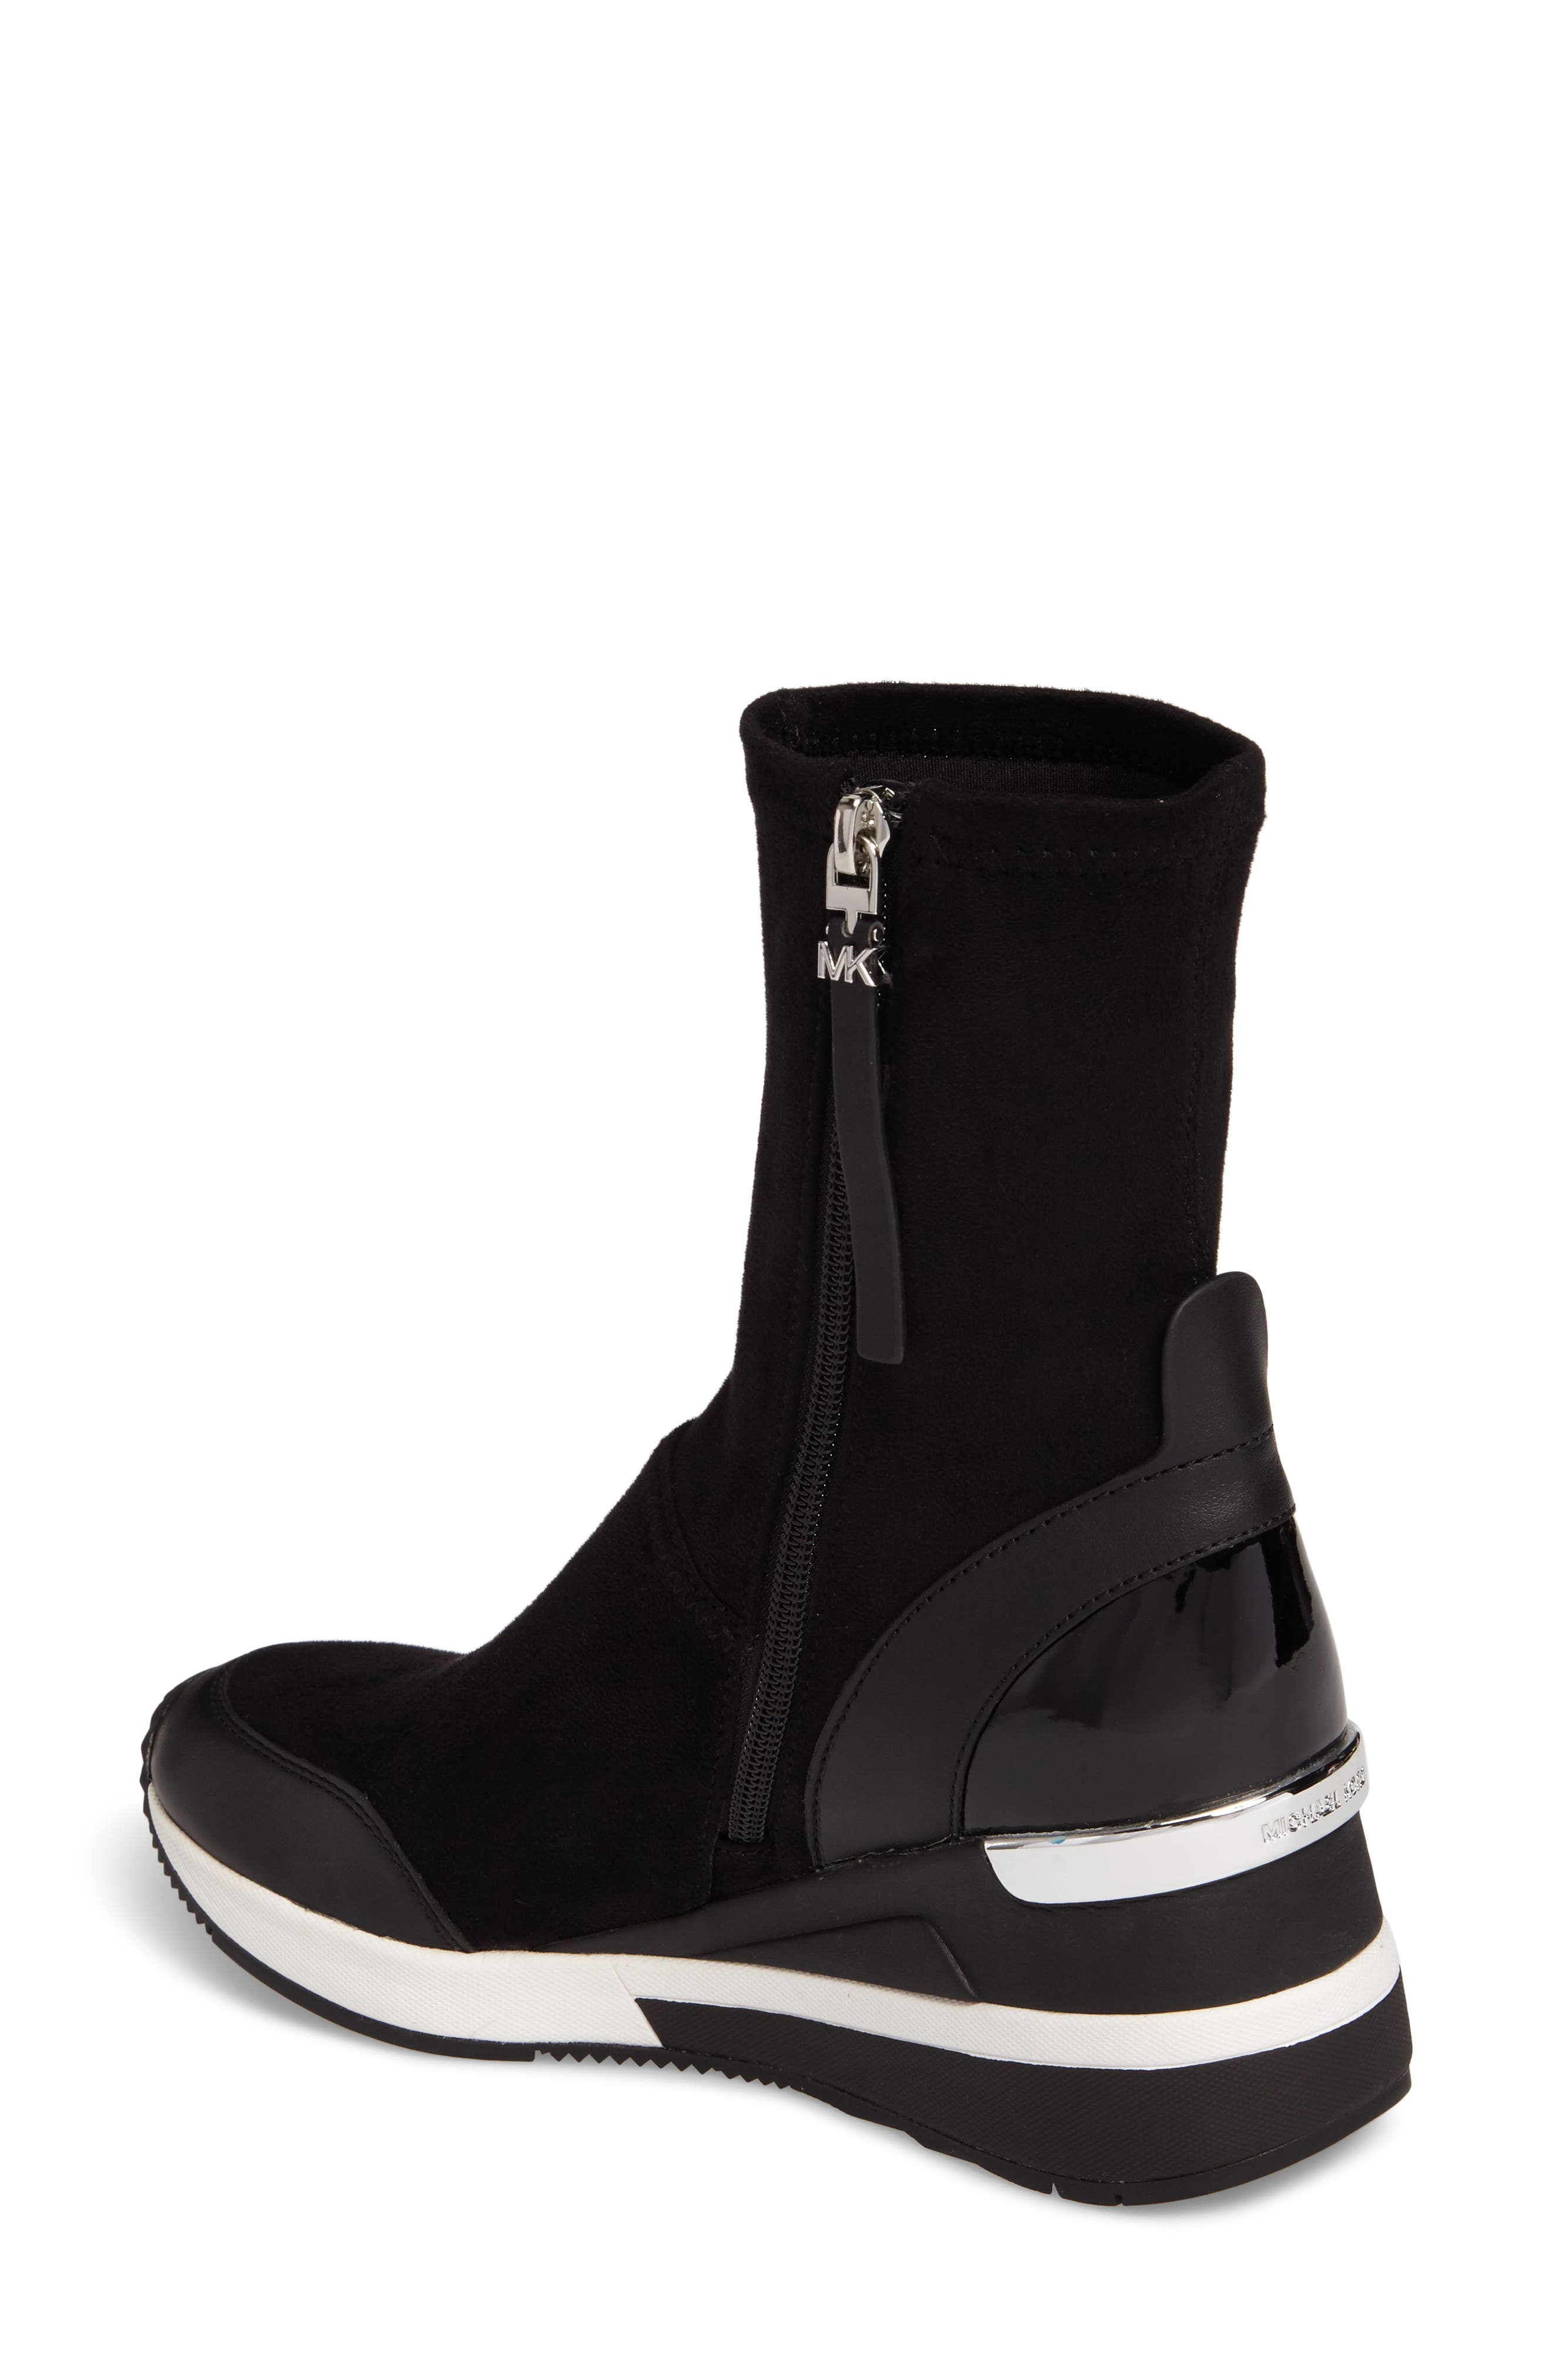 'Ace' Wedge Sneaker Bootie,                             Alternate thumbnail 2, color,                             BLACK SUEDE